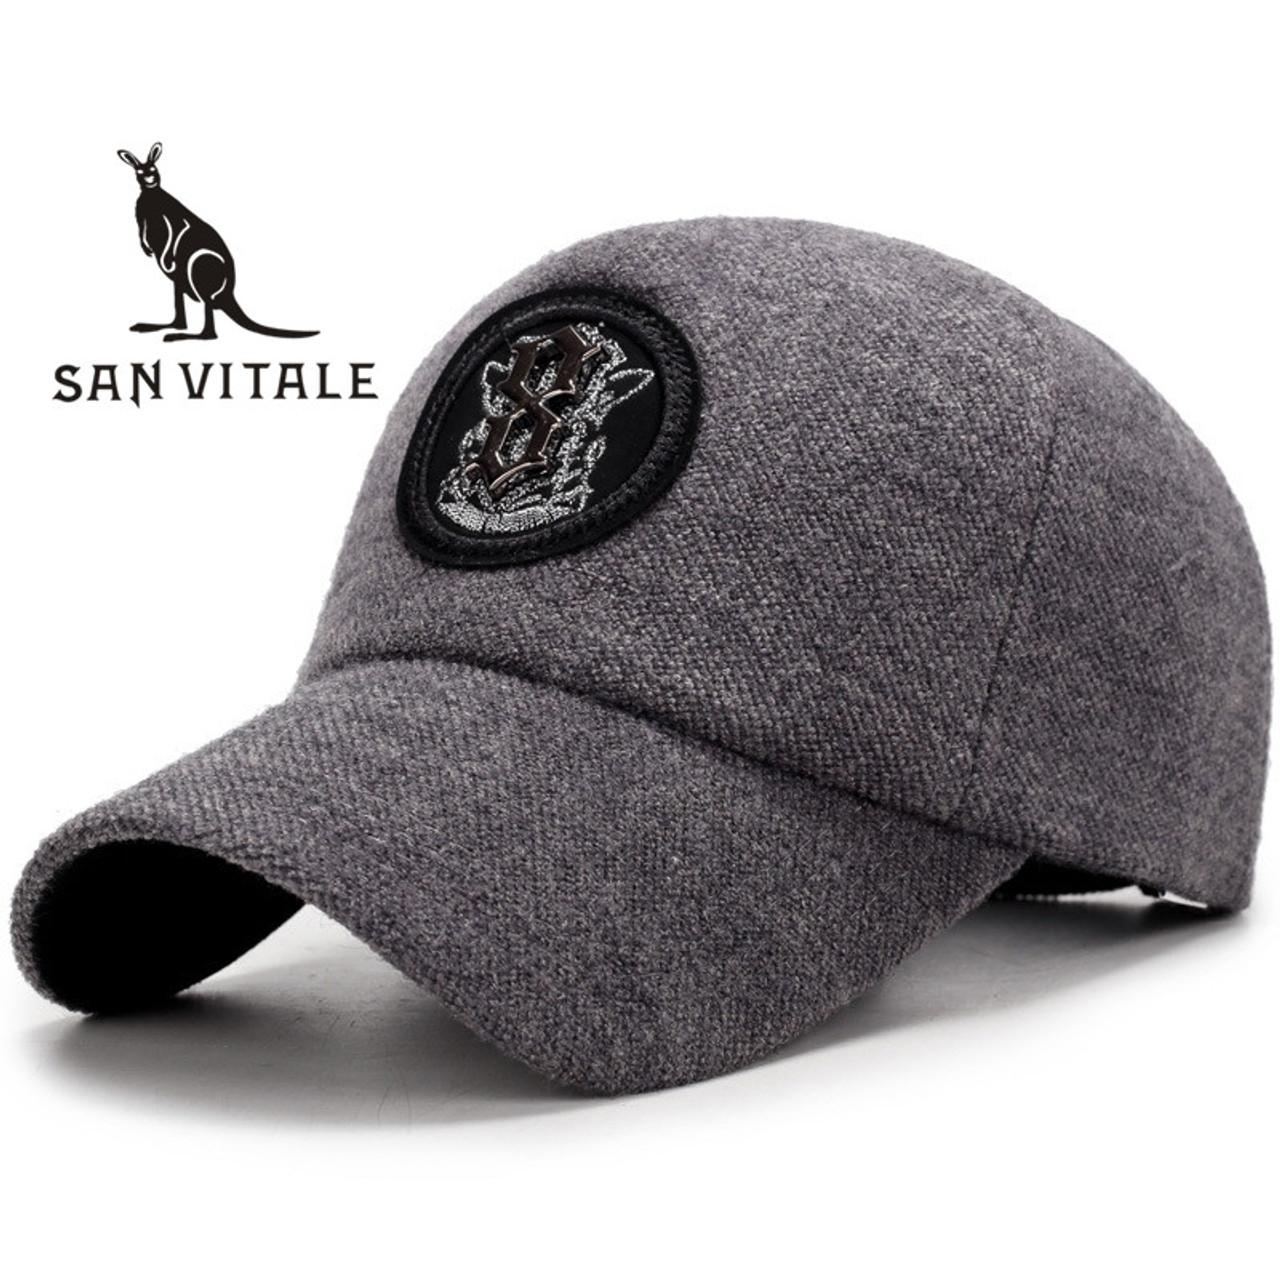 4eeeb980324f32 Baseball Cap Mens Hat Spring Chance The Rapper Hats Custom Snapback Cowboy  Man Black Luxury Brand ...